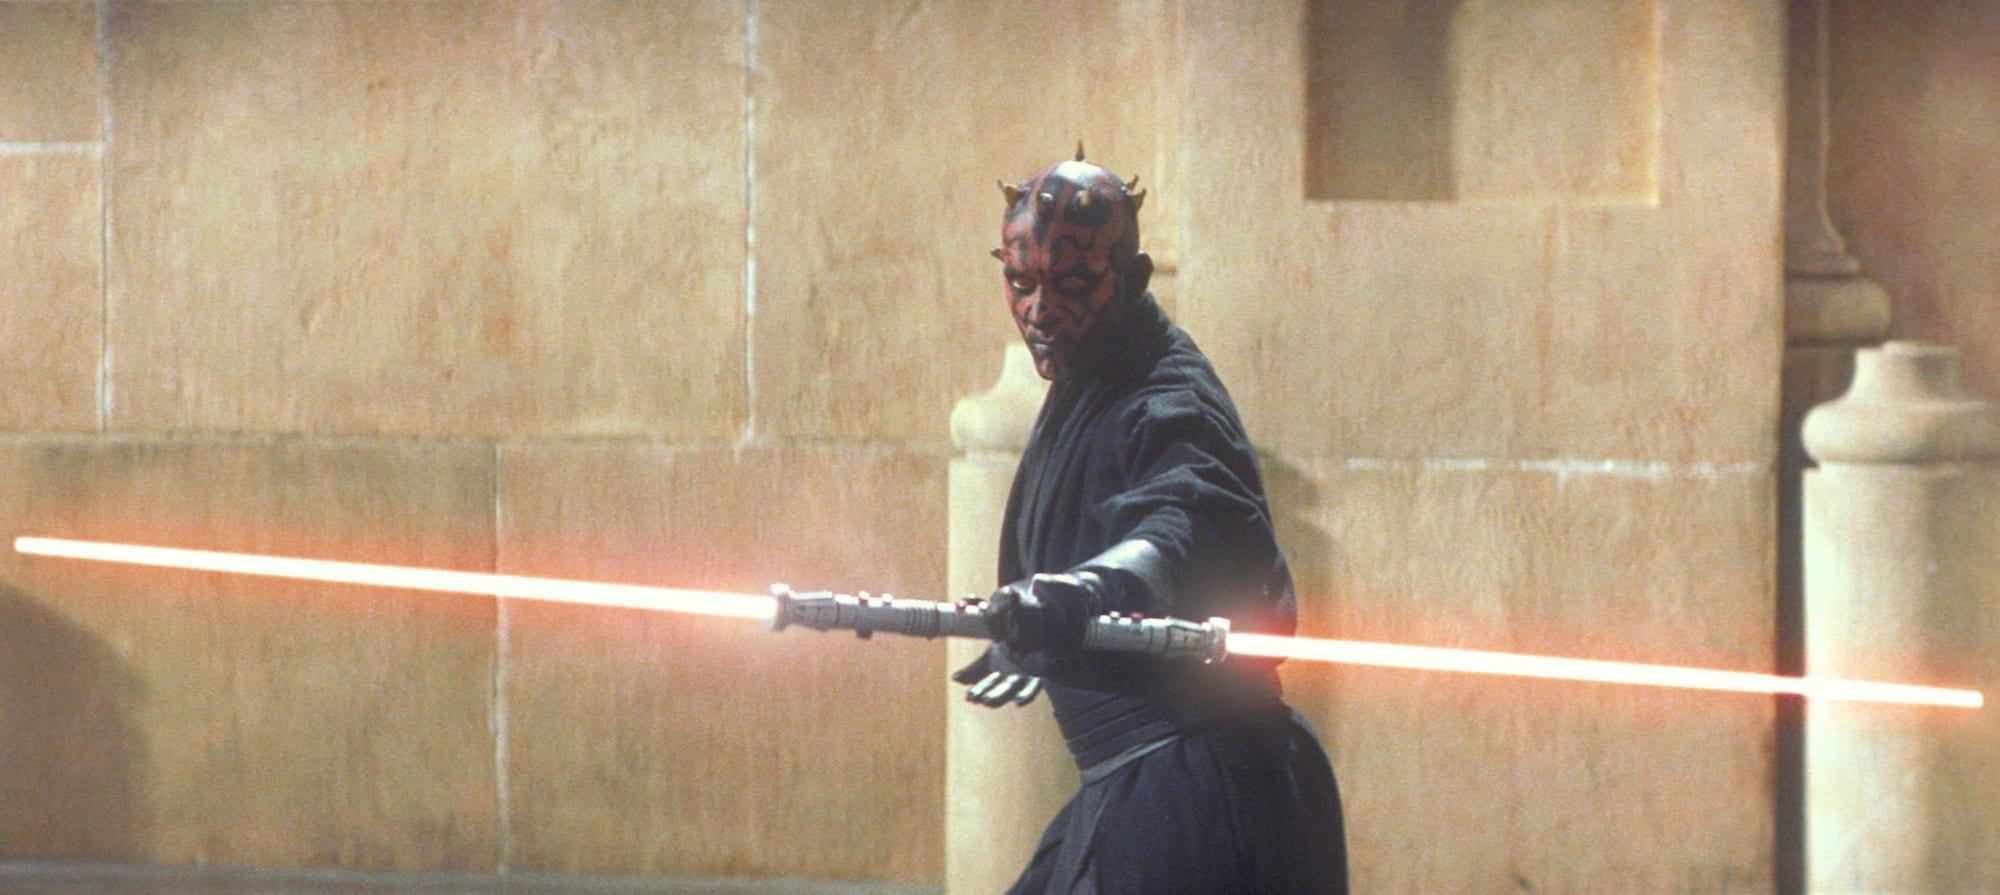 Star Wars: Will Darth Maul be in The Mandalorian?